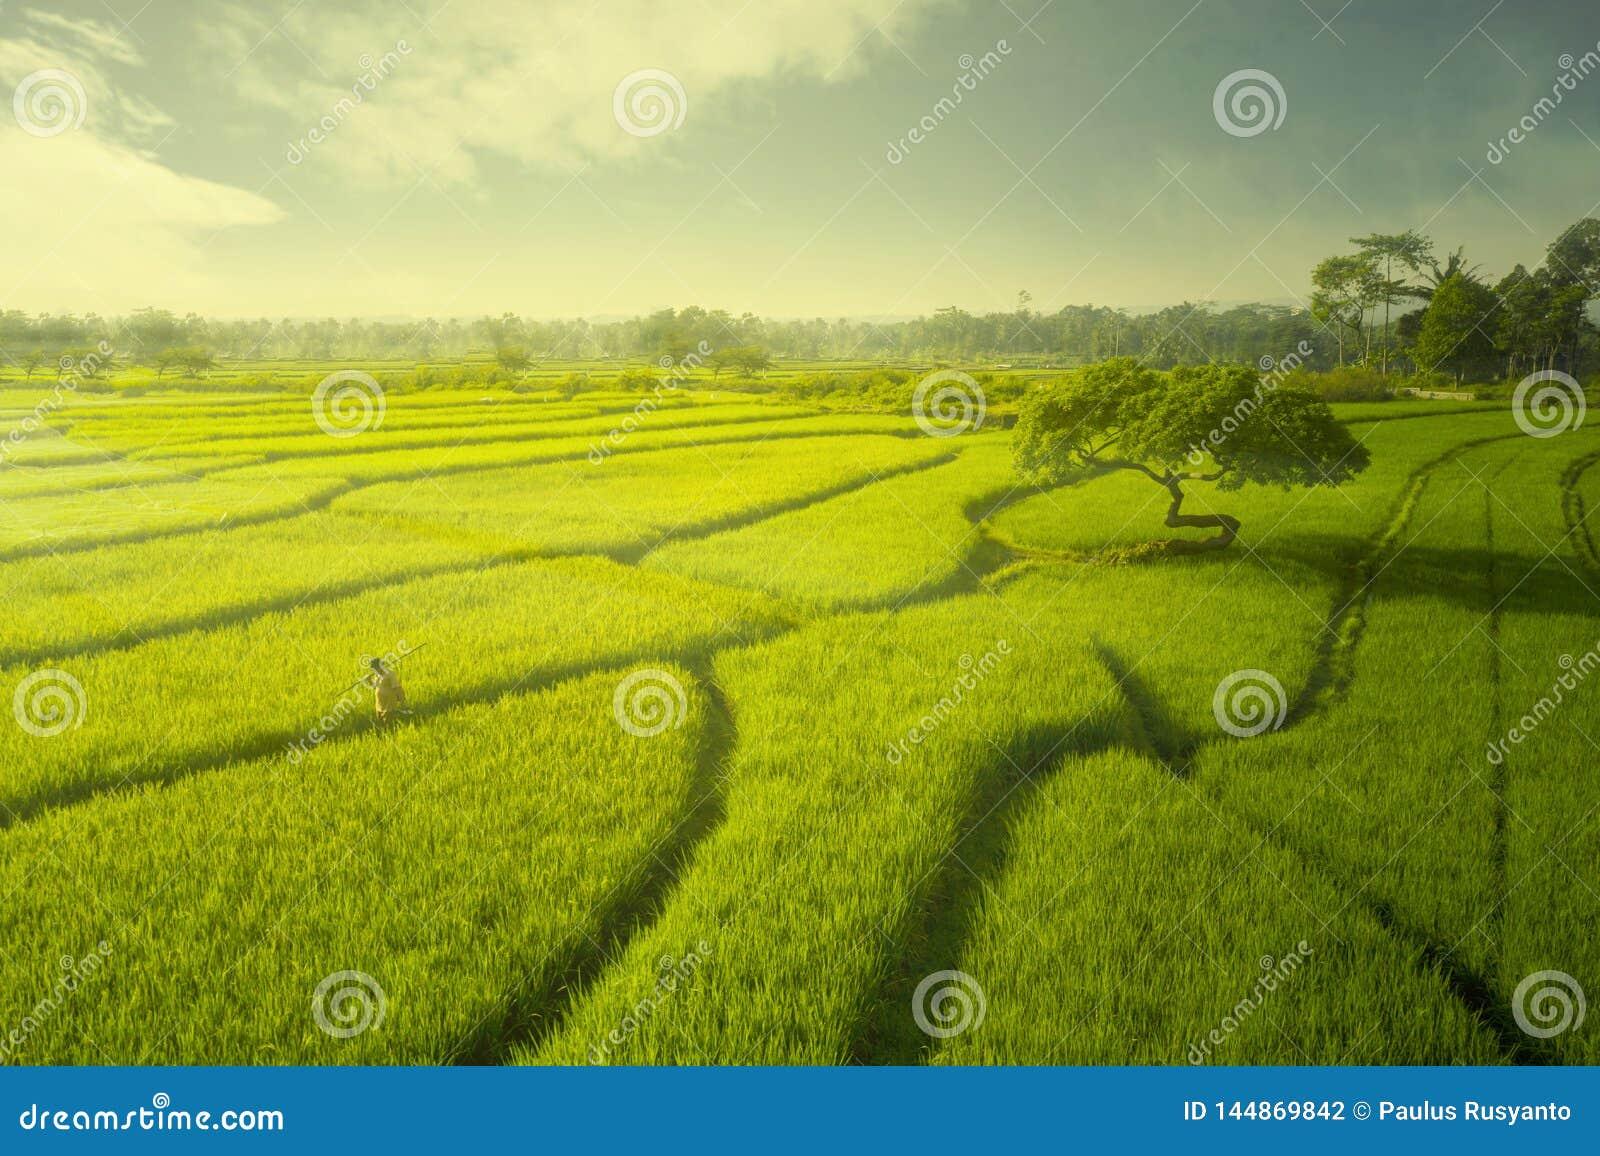 Male farmer walking on the rice field at dusk